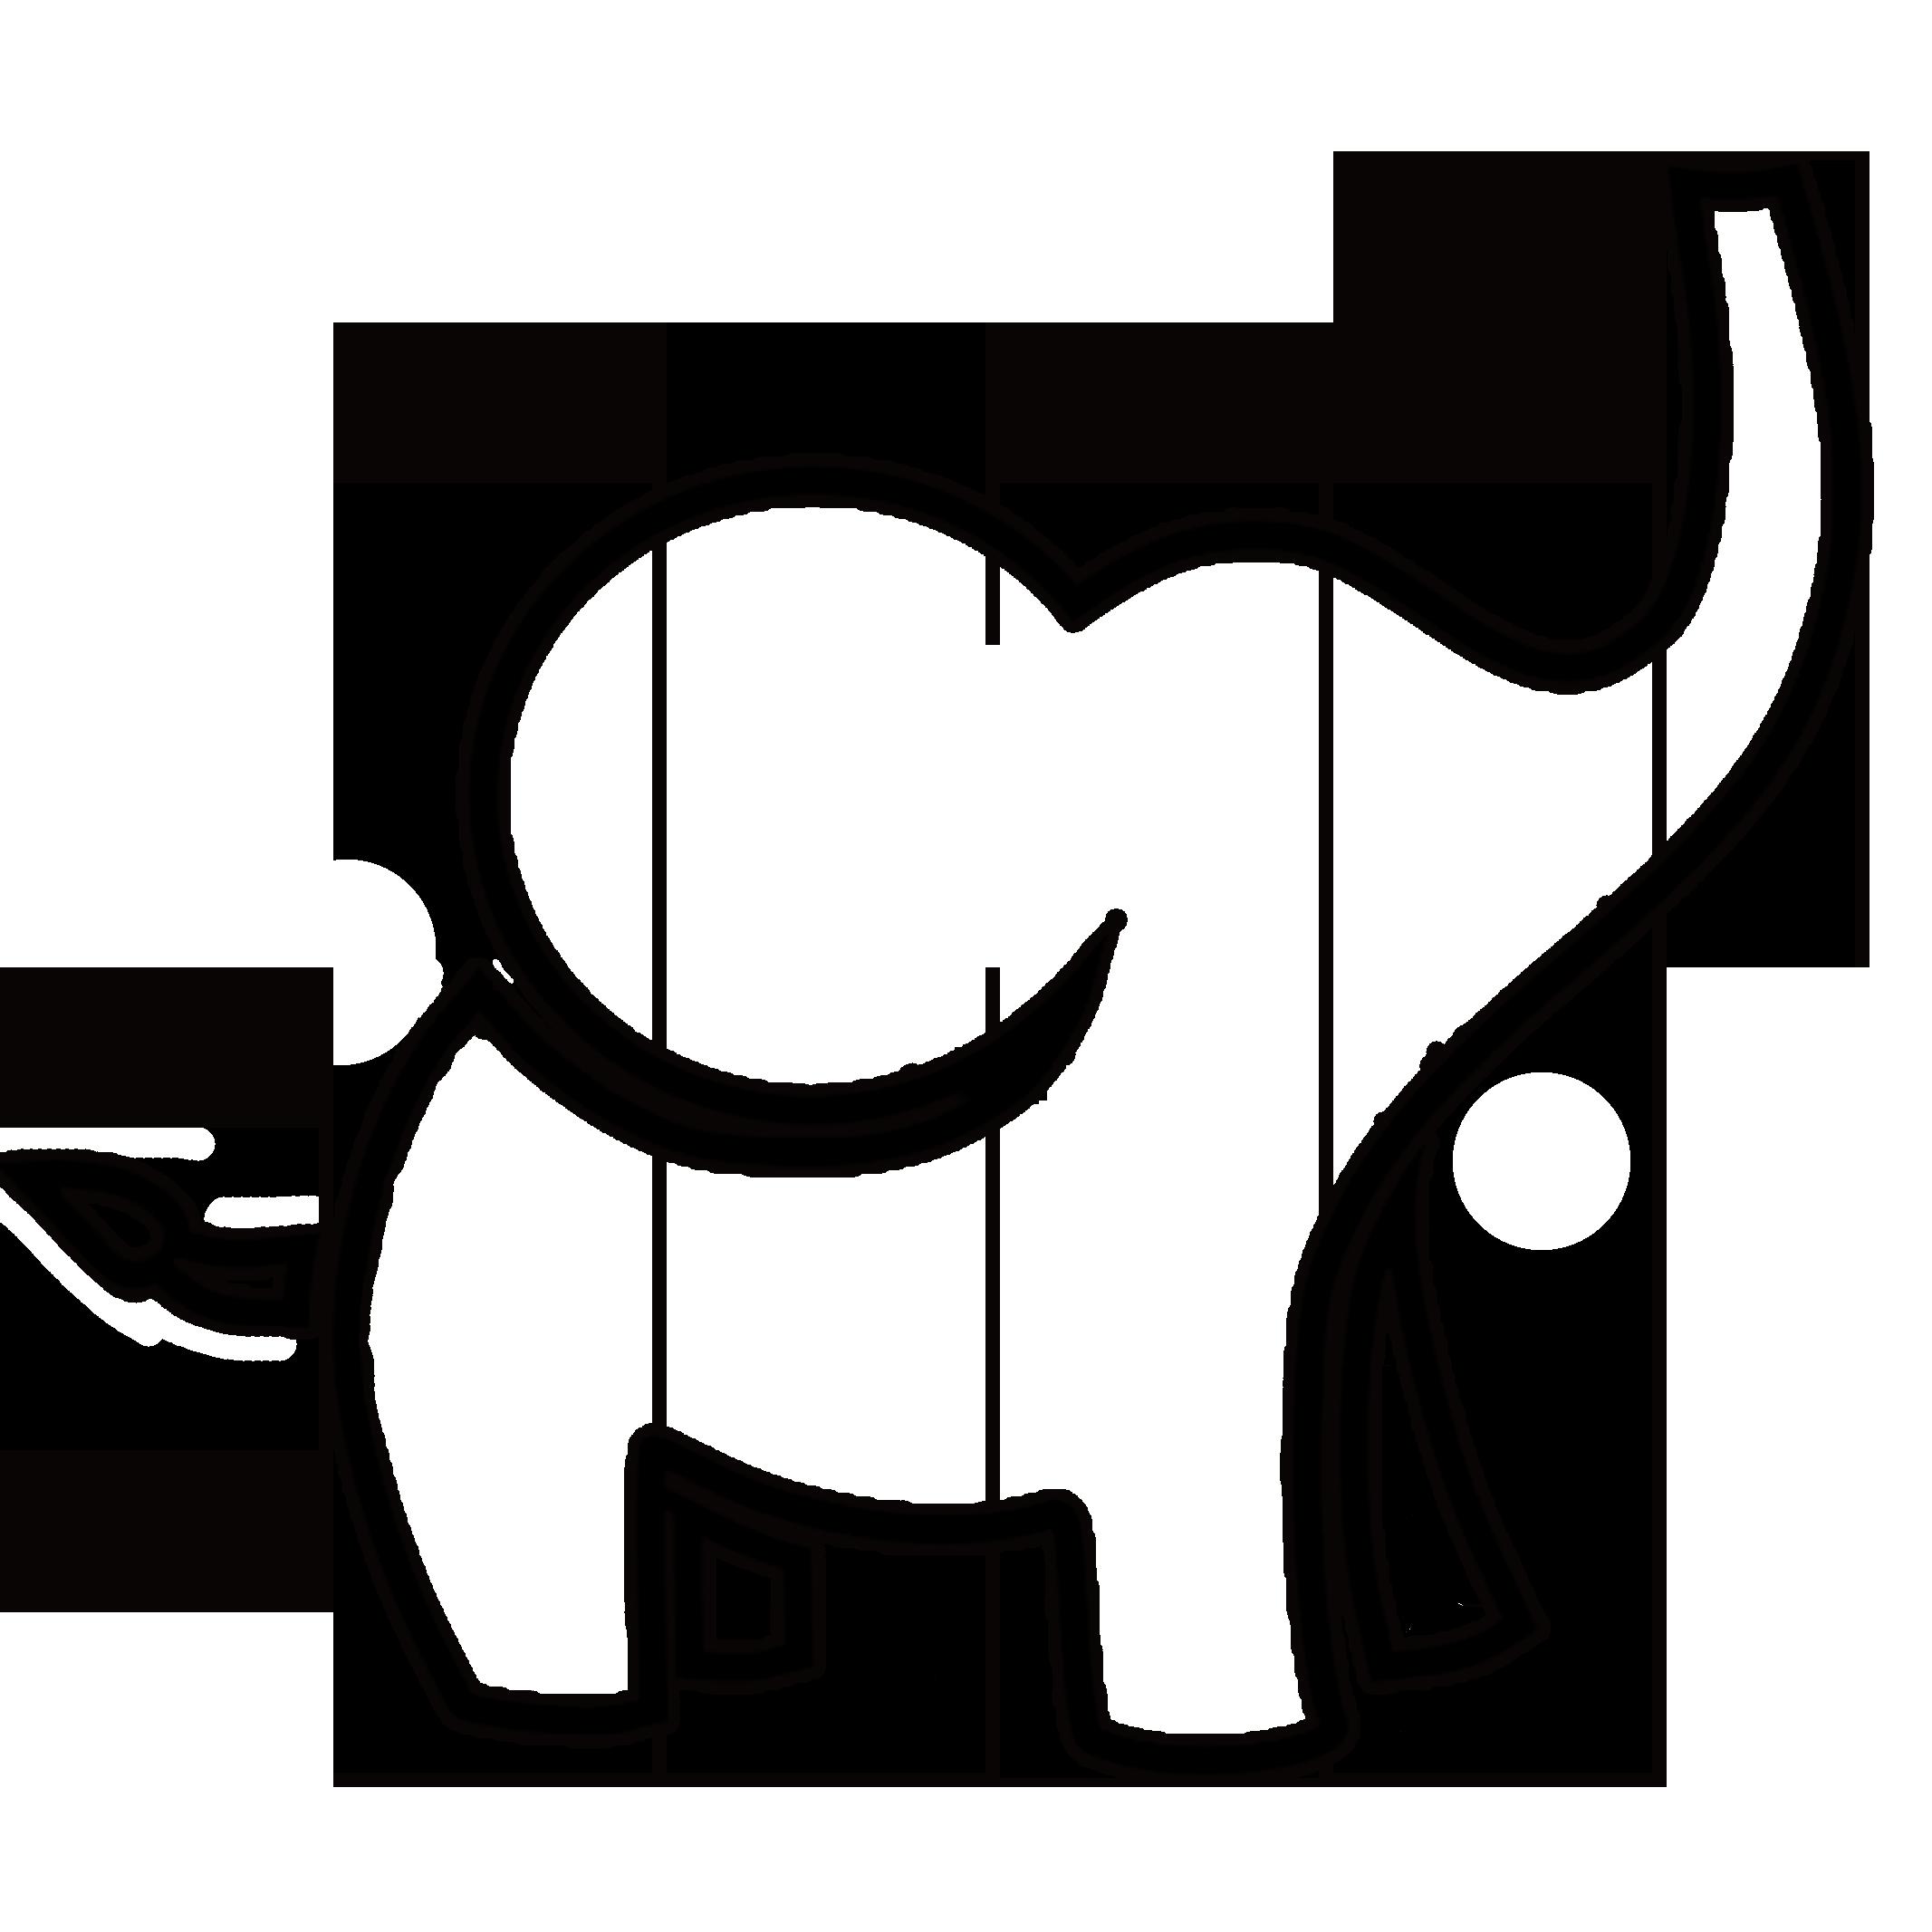 Pulp Elephants